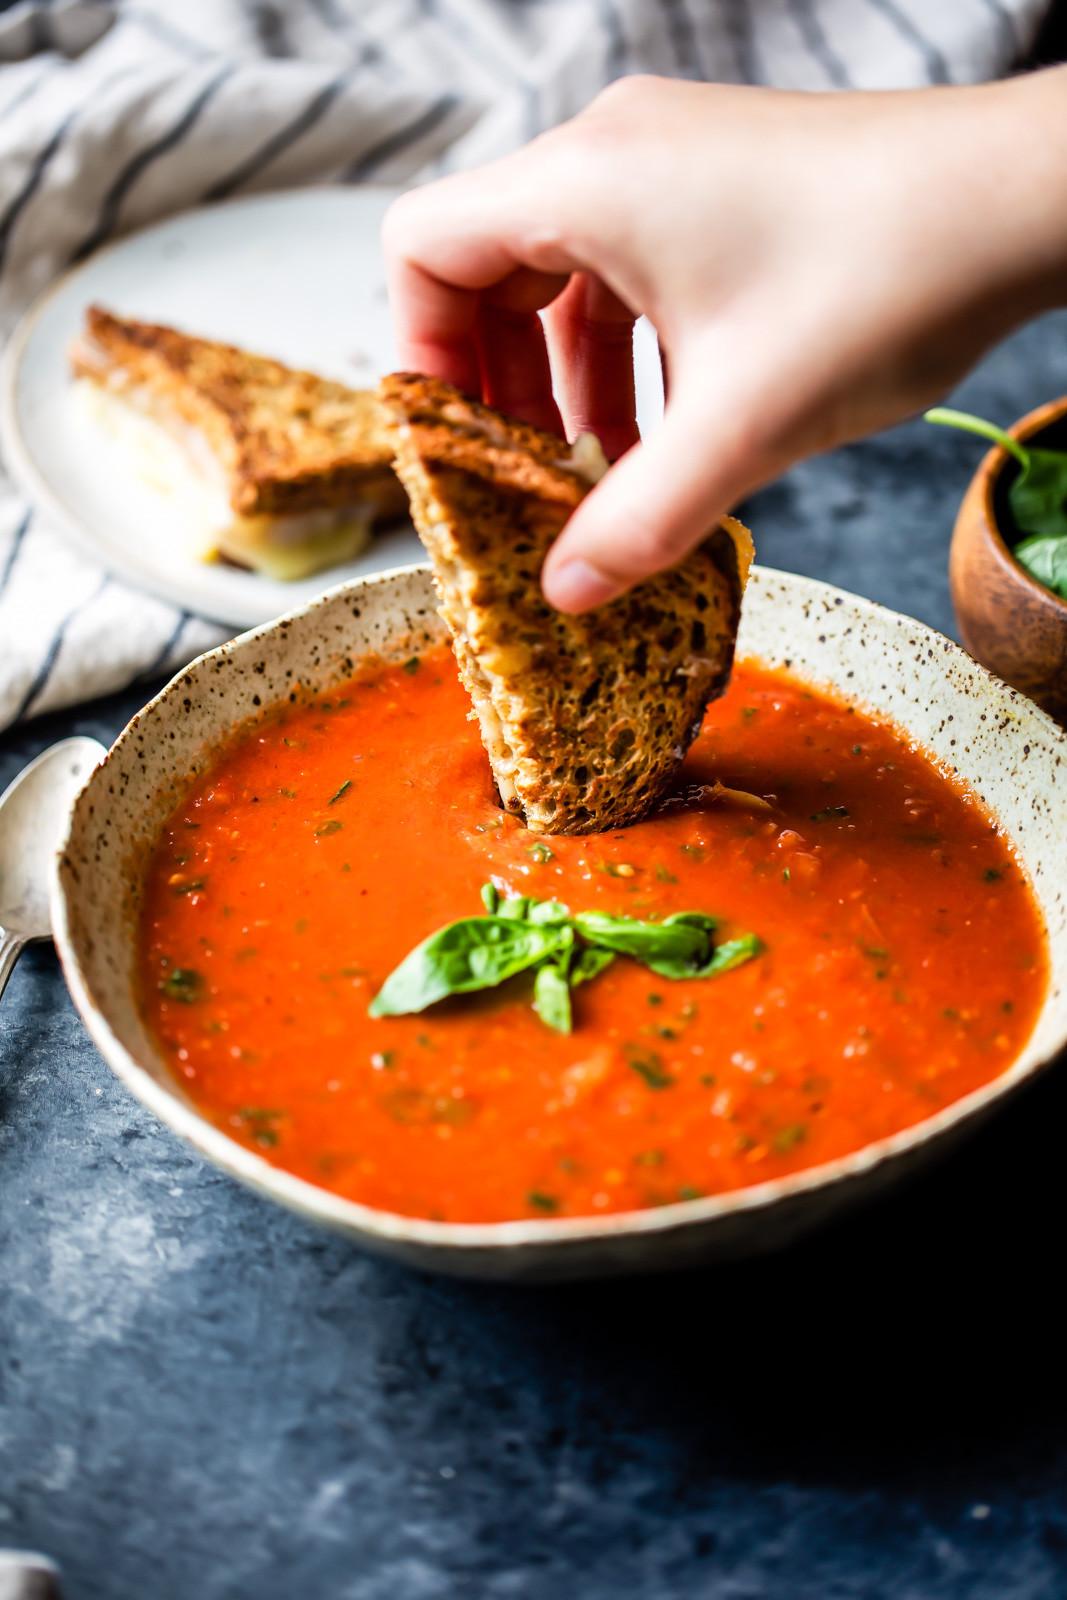 Homemade Tomato Basil Soup  Homemade Roasted Tomato Basil Soup video